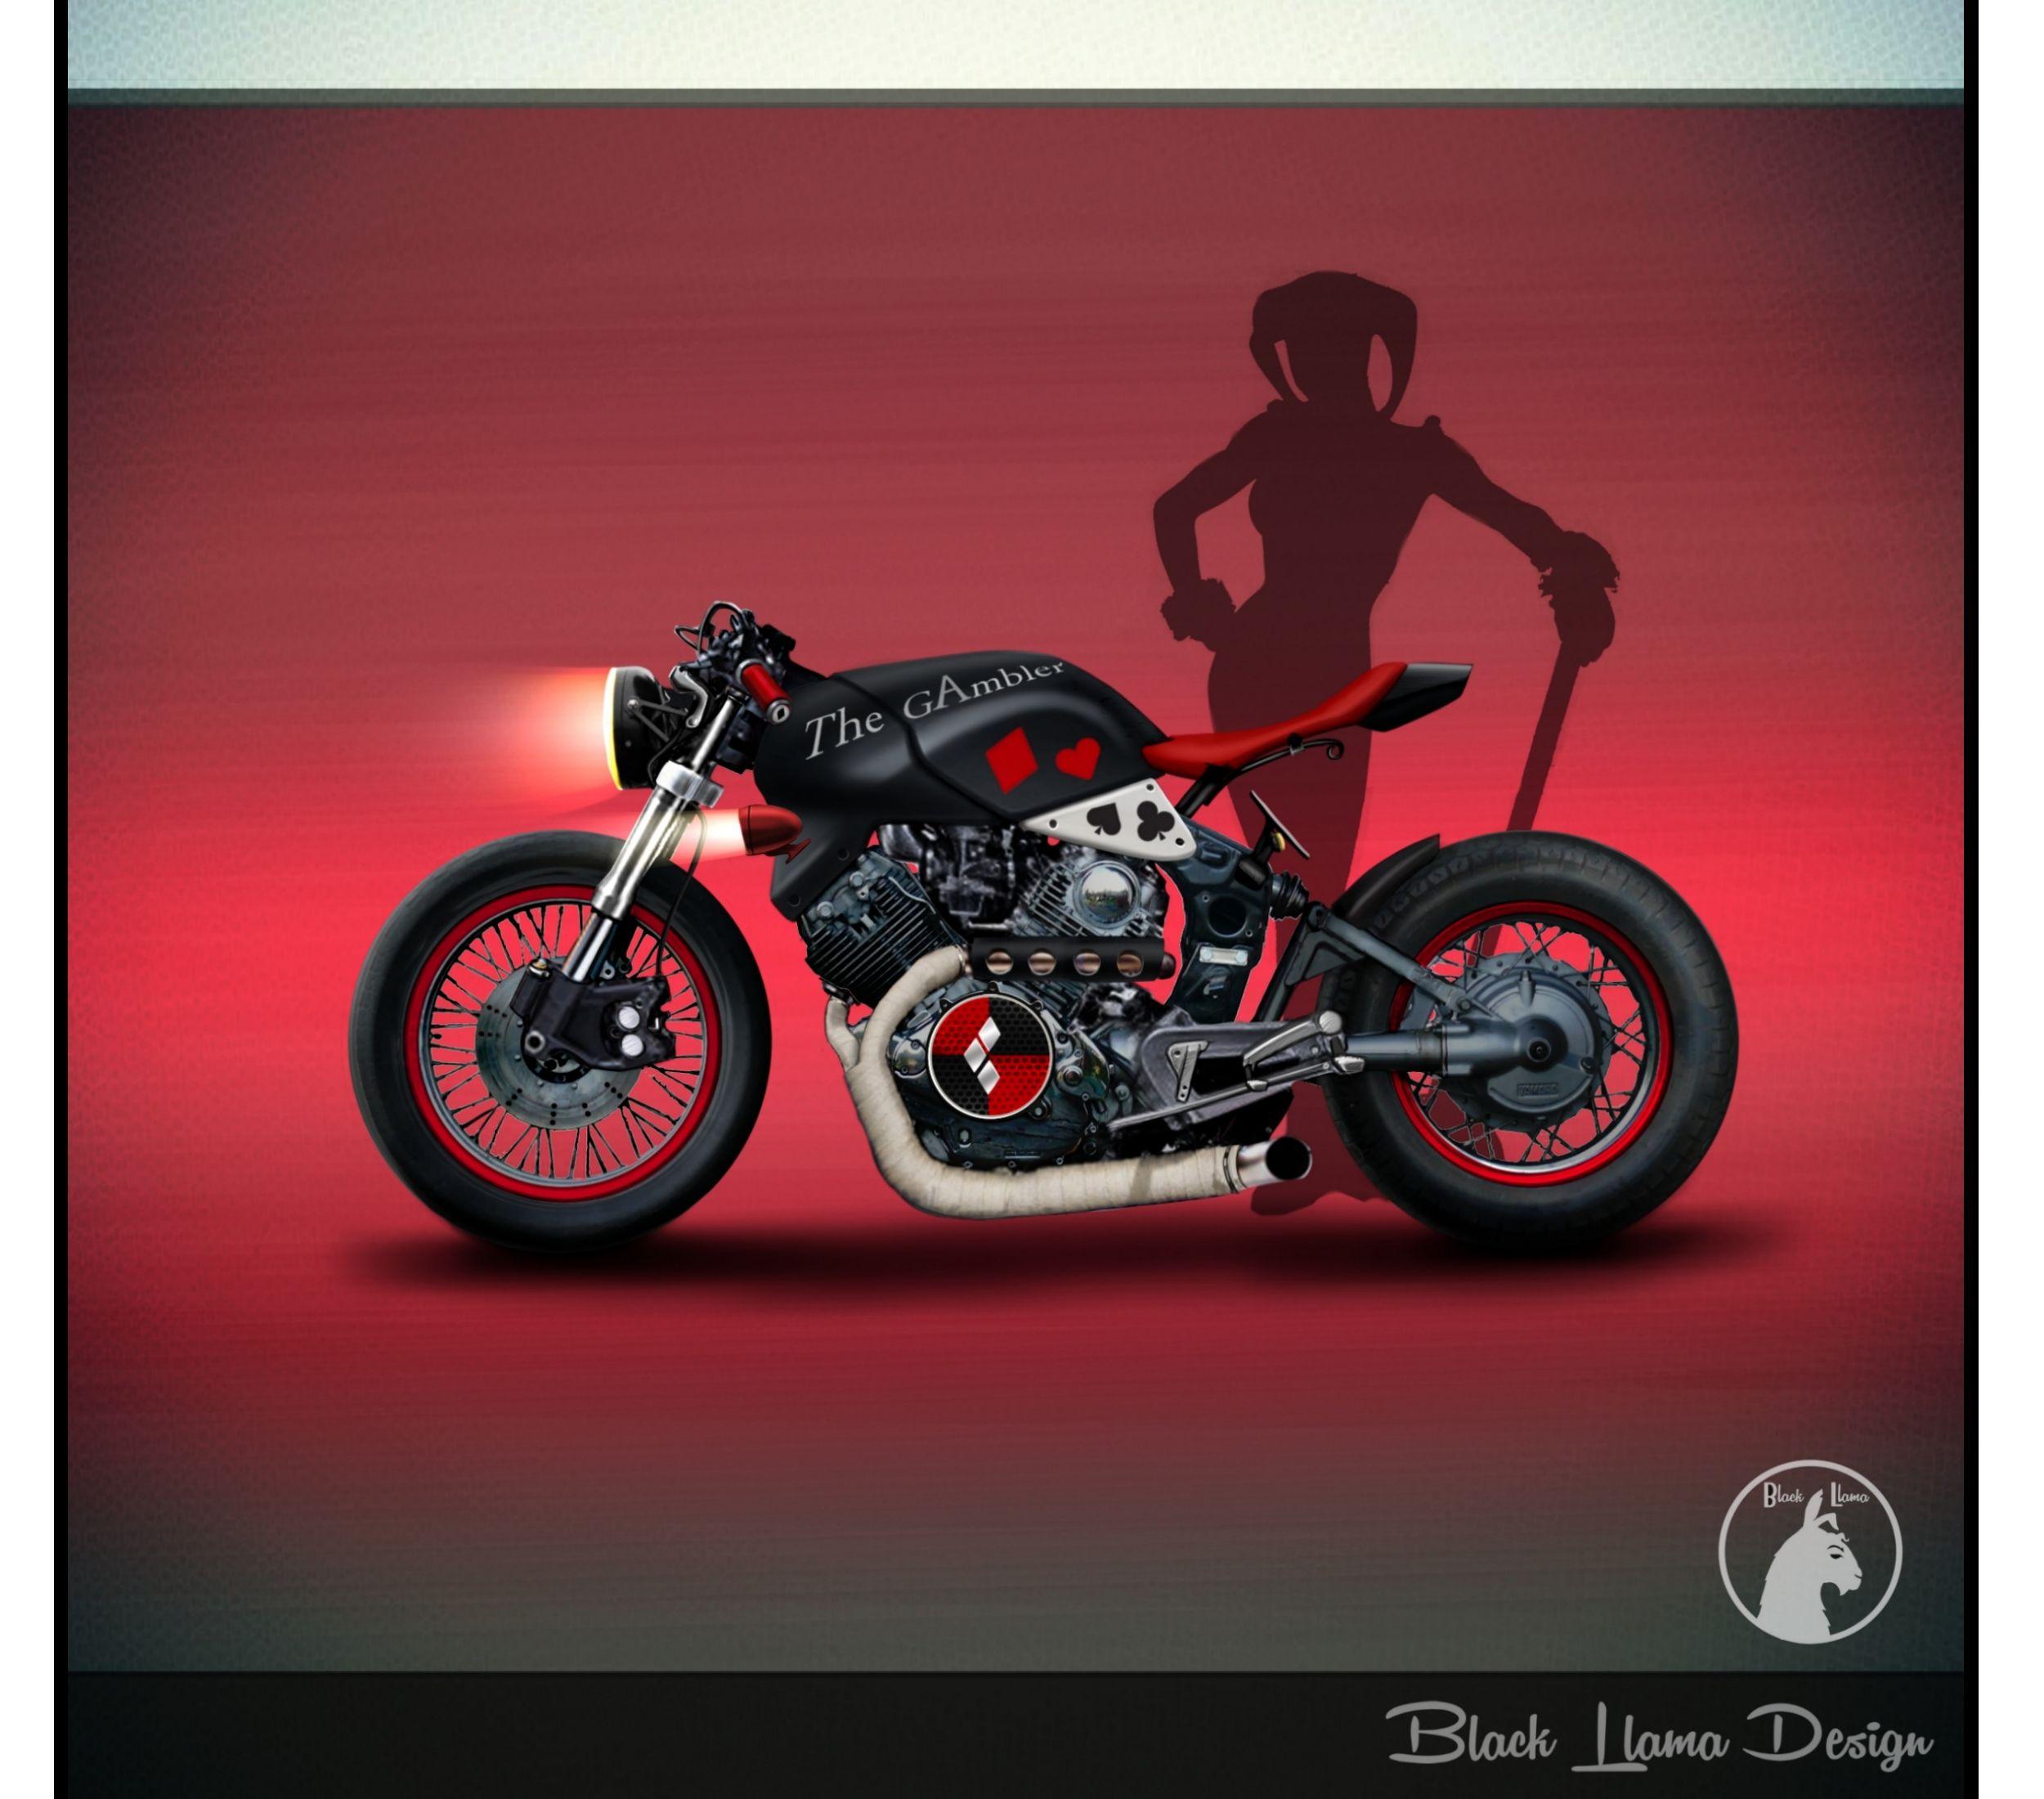 Harley Quinn Motorcycle Yamaha Virago Black Llama Design